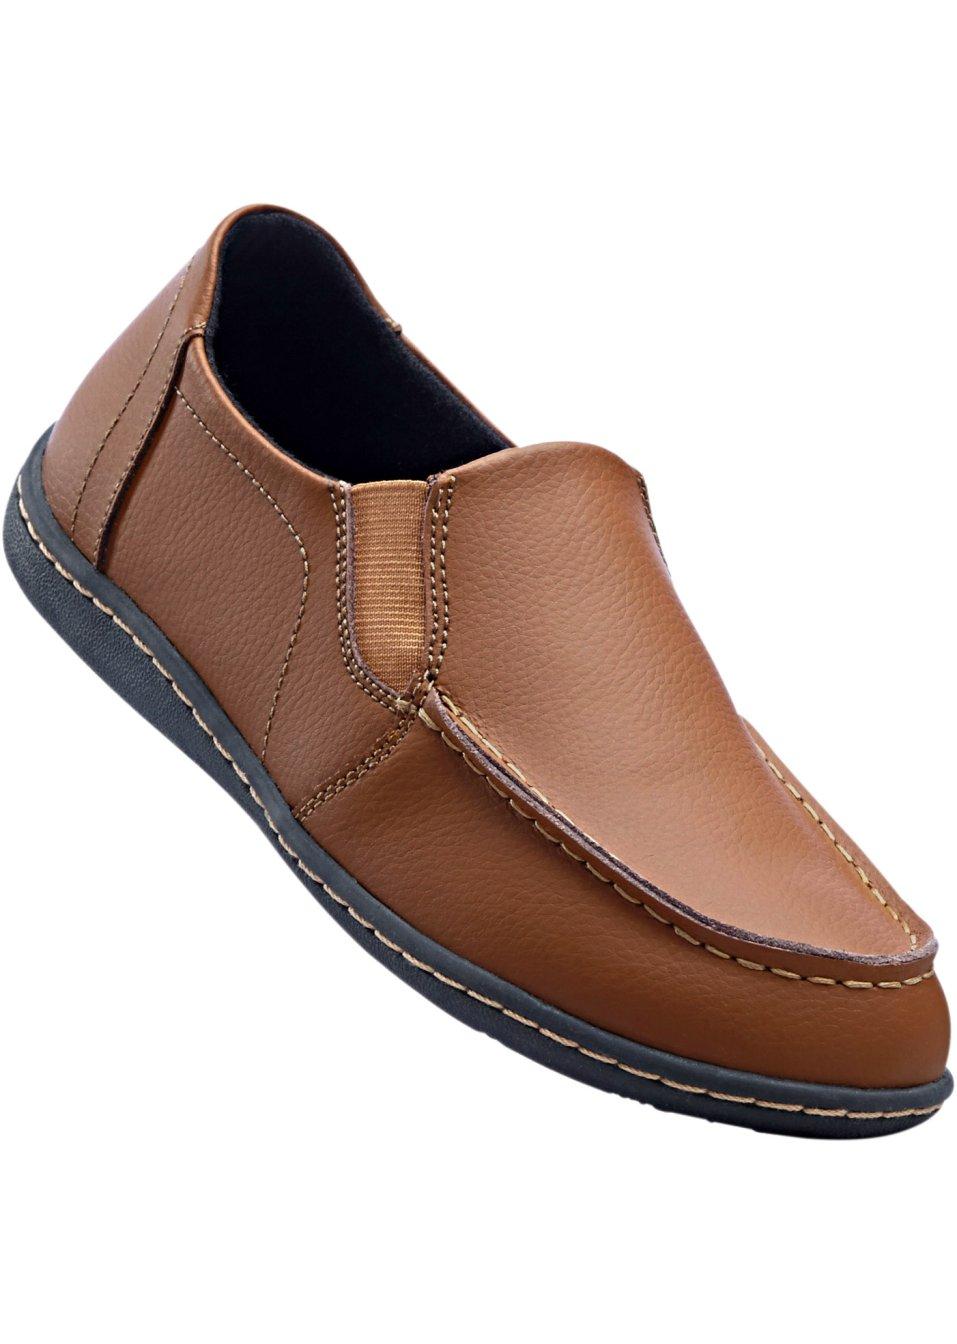 slippers en cuir camel bpc selection acheter online. Black Bedroom Furniture Sets. Home Design Ideas